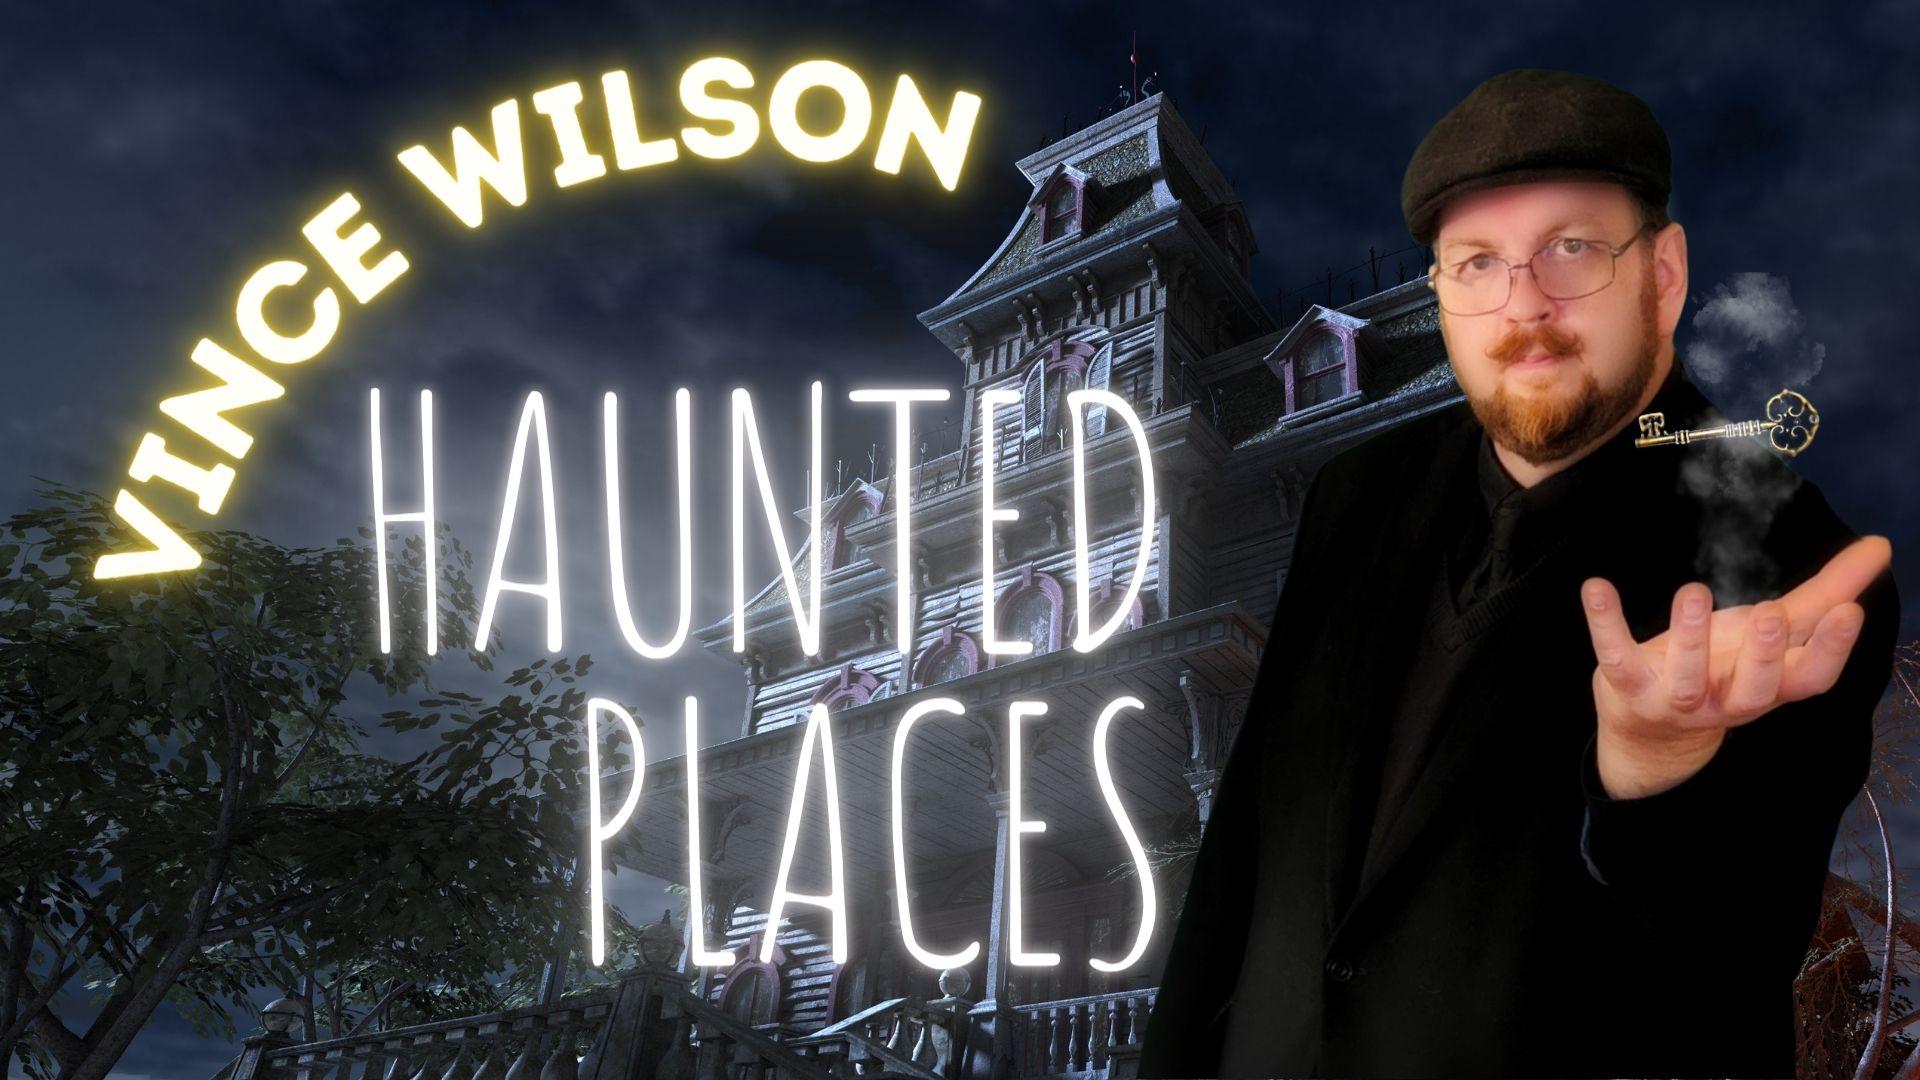 haunted paces promo ad